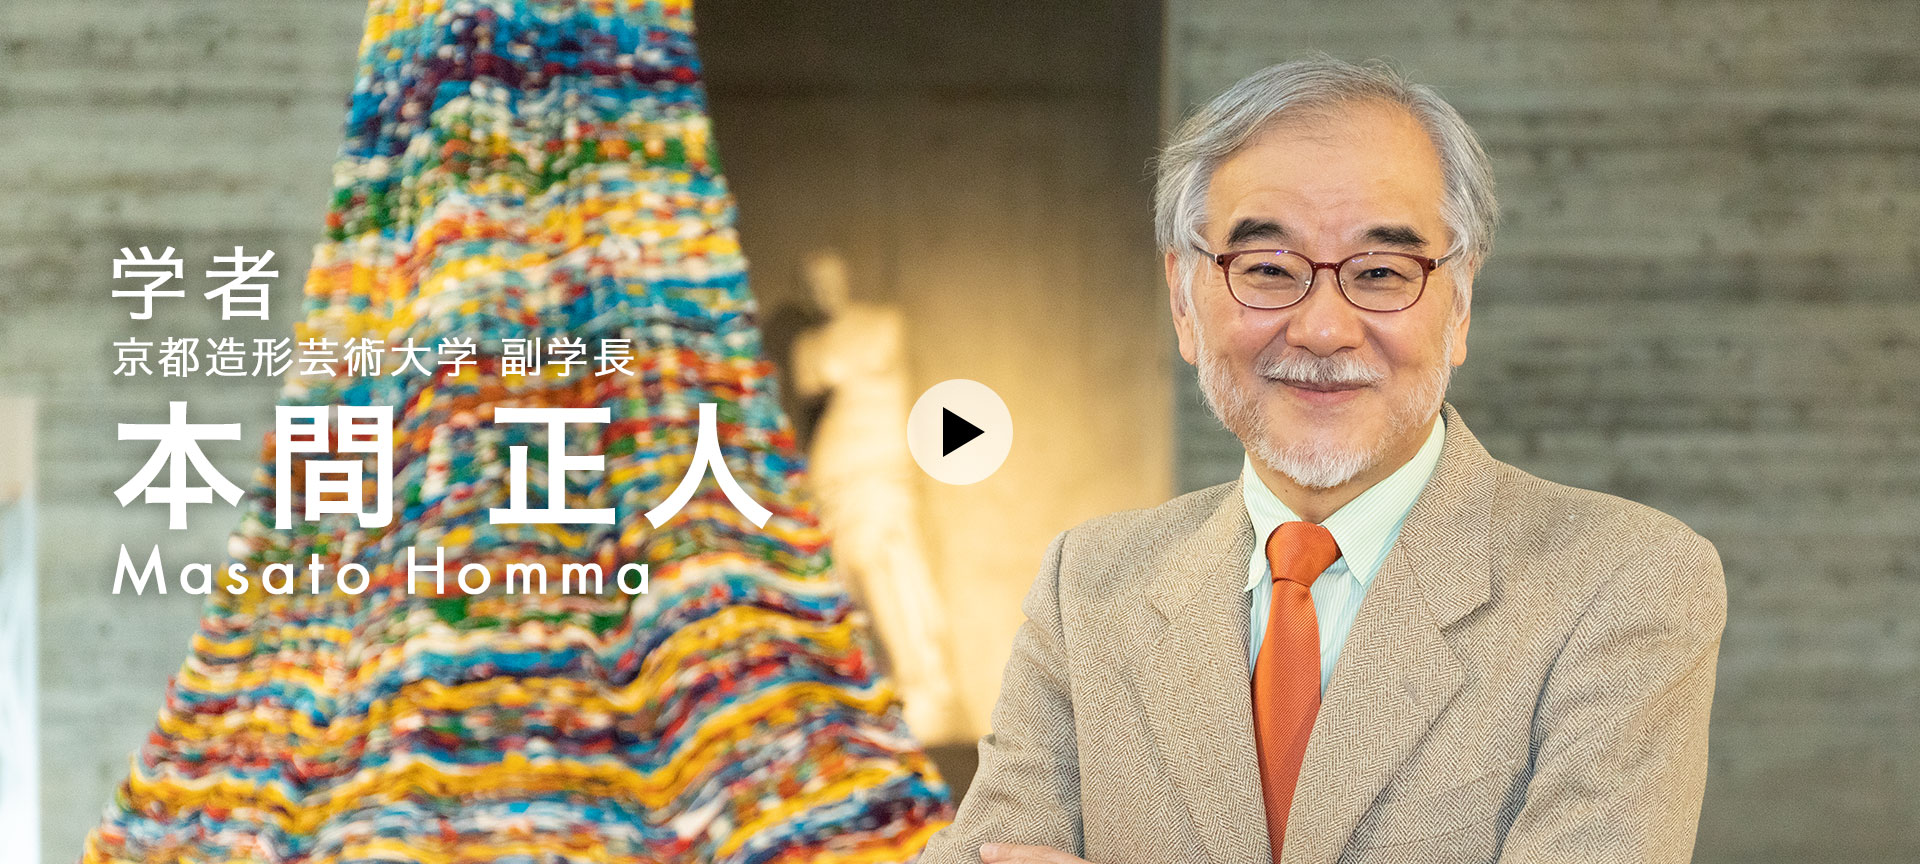 OWNDAYS MEETS 本間正人(Masato Homma)